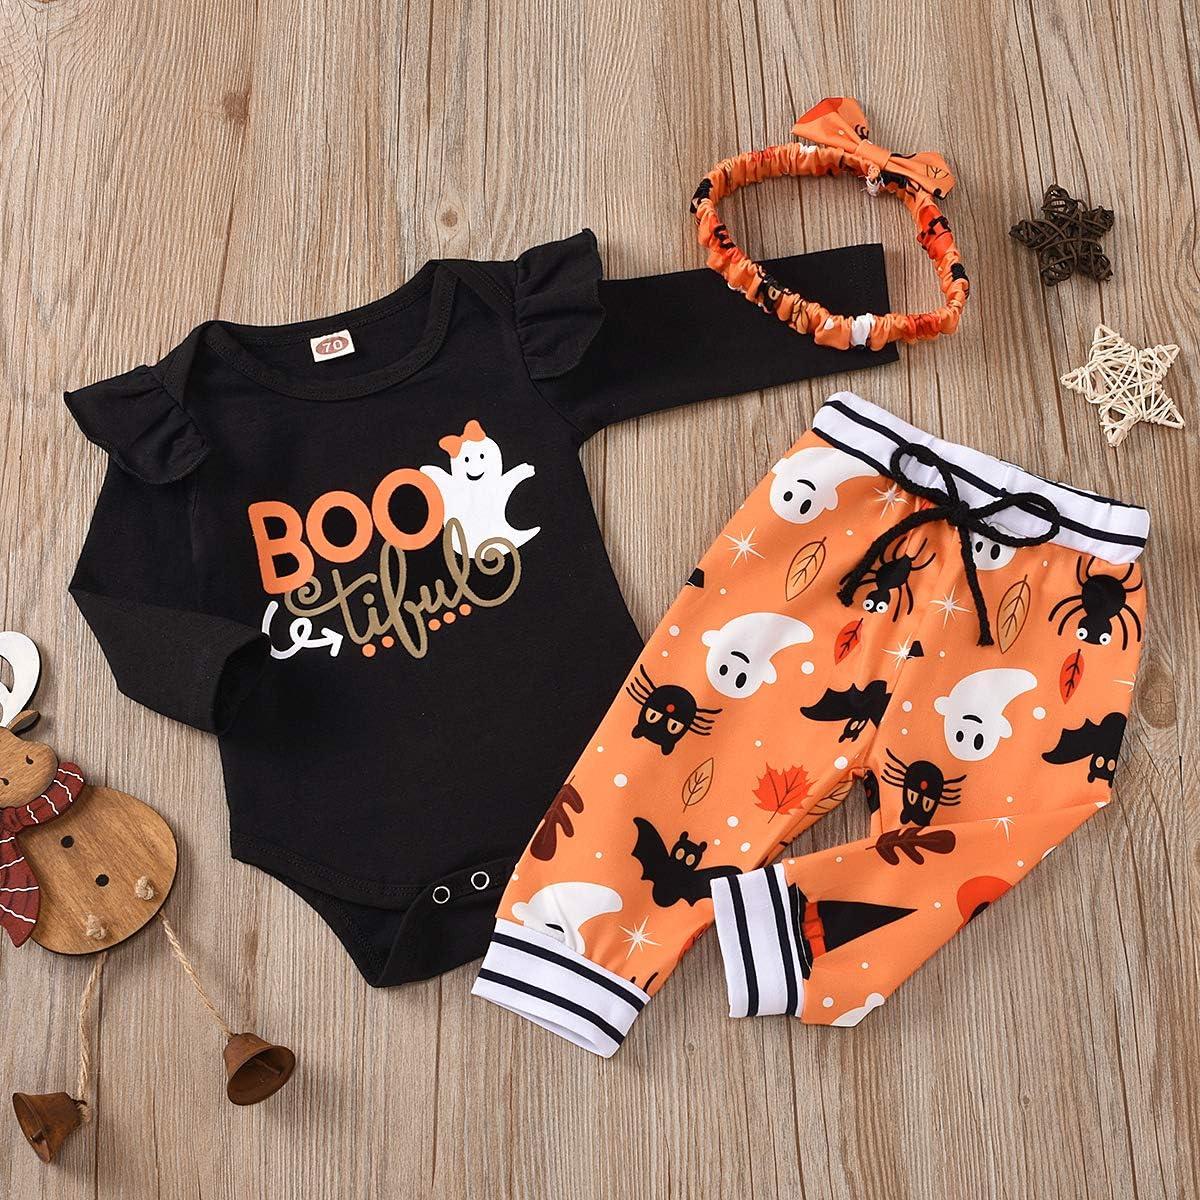 Pants Happy Halloween Newborn Baby Boy Girl Clothes Long Sleeve Mummy Printed Romper Hats 3Pcs Outfits Set